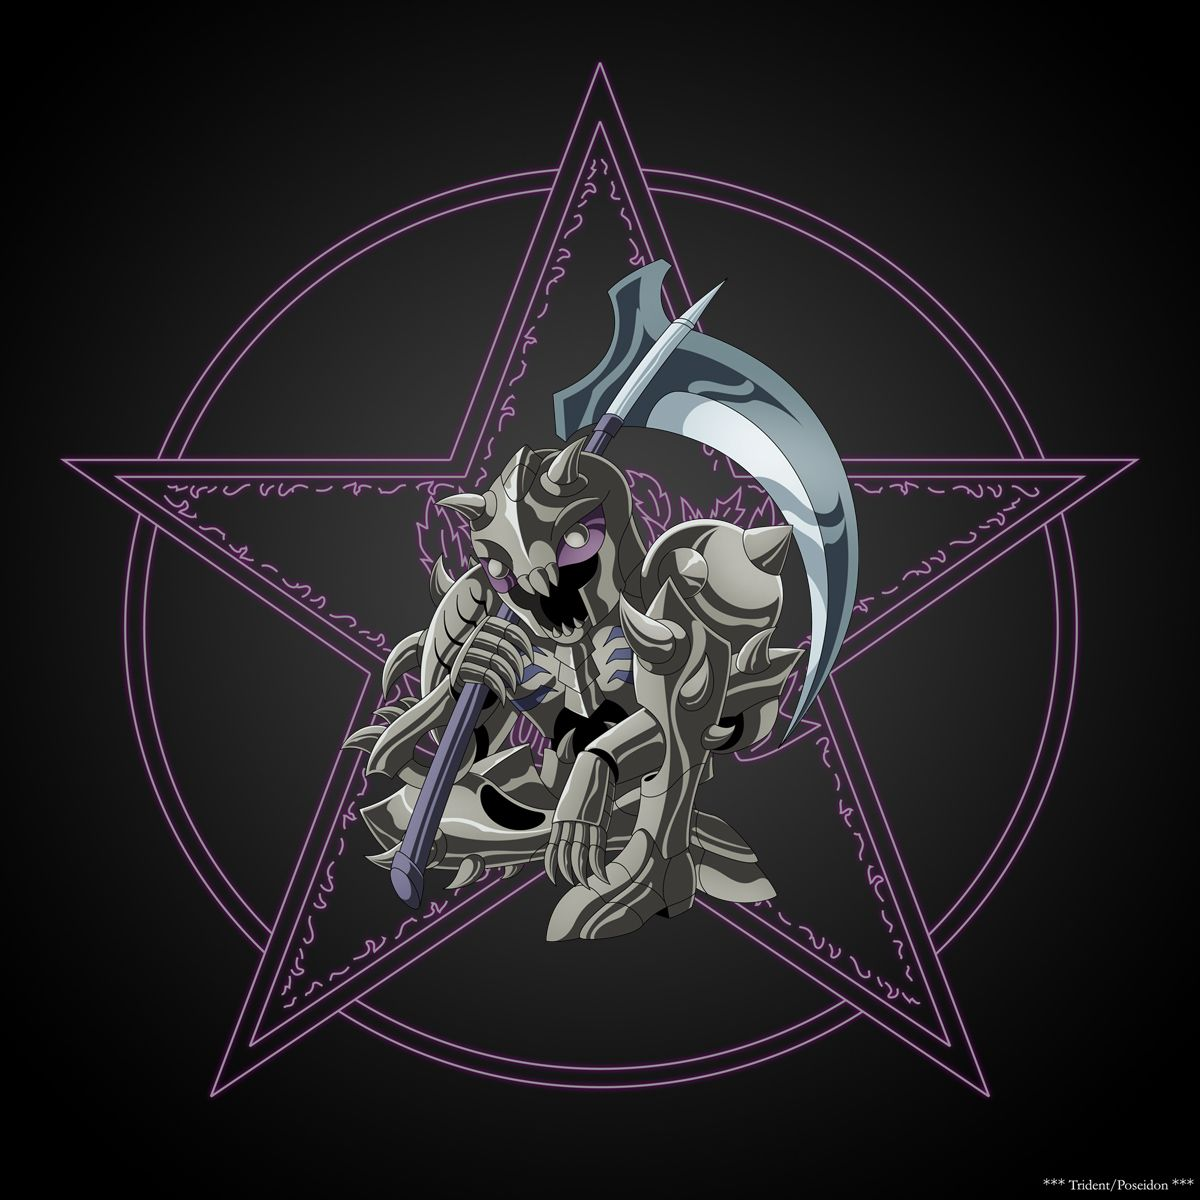 Skeleton Surplice by Trident-Poseidon